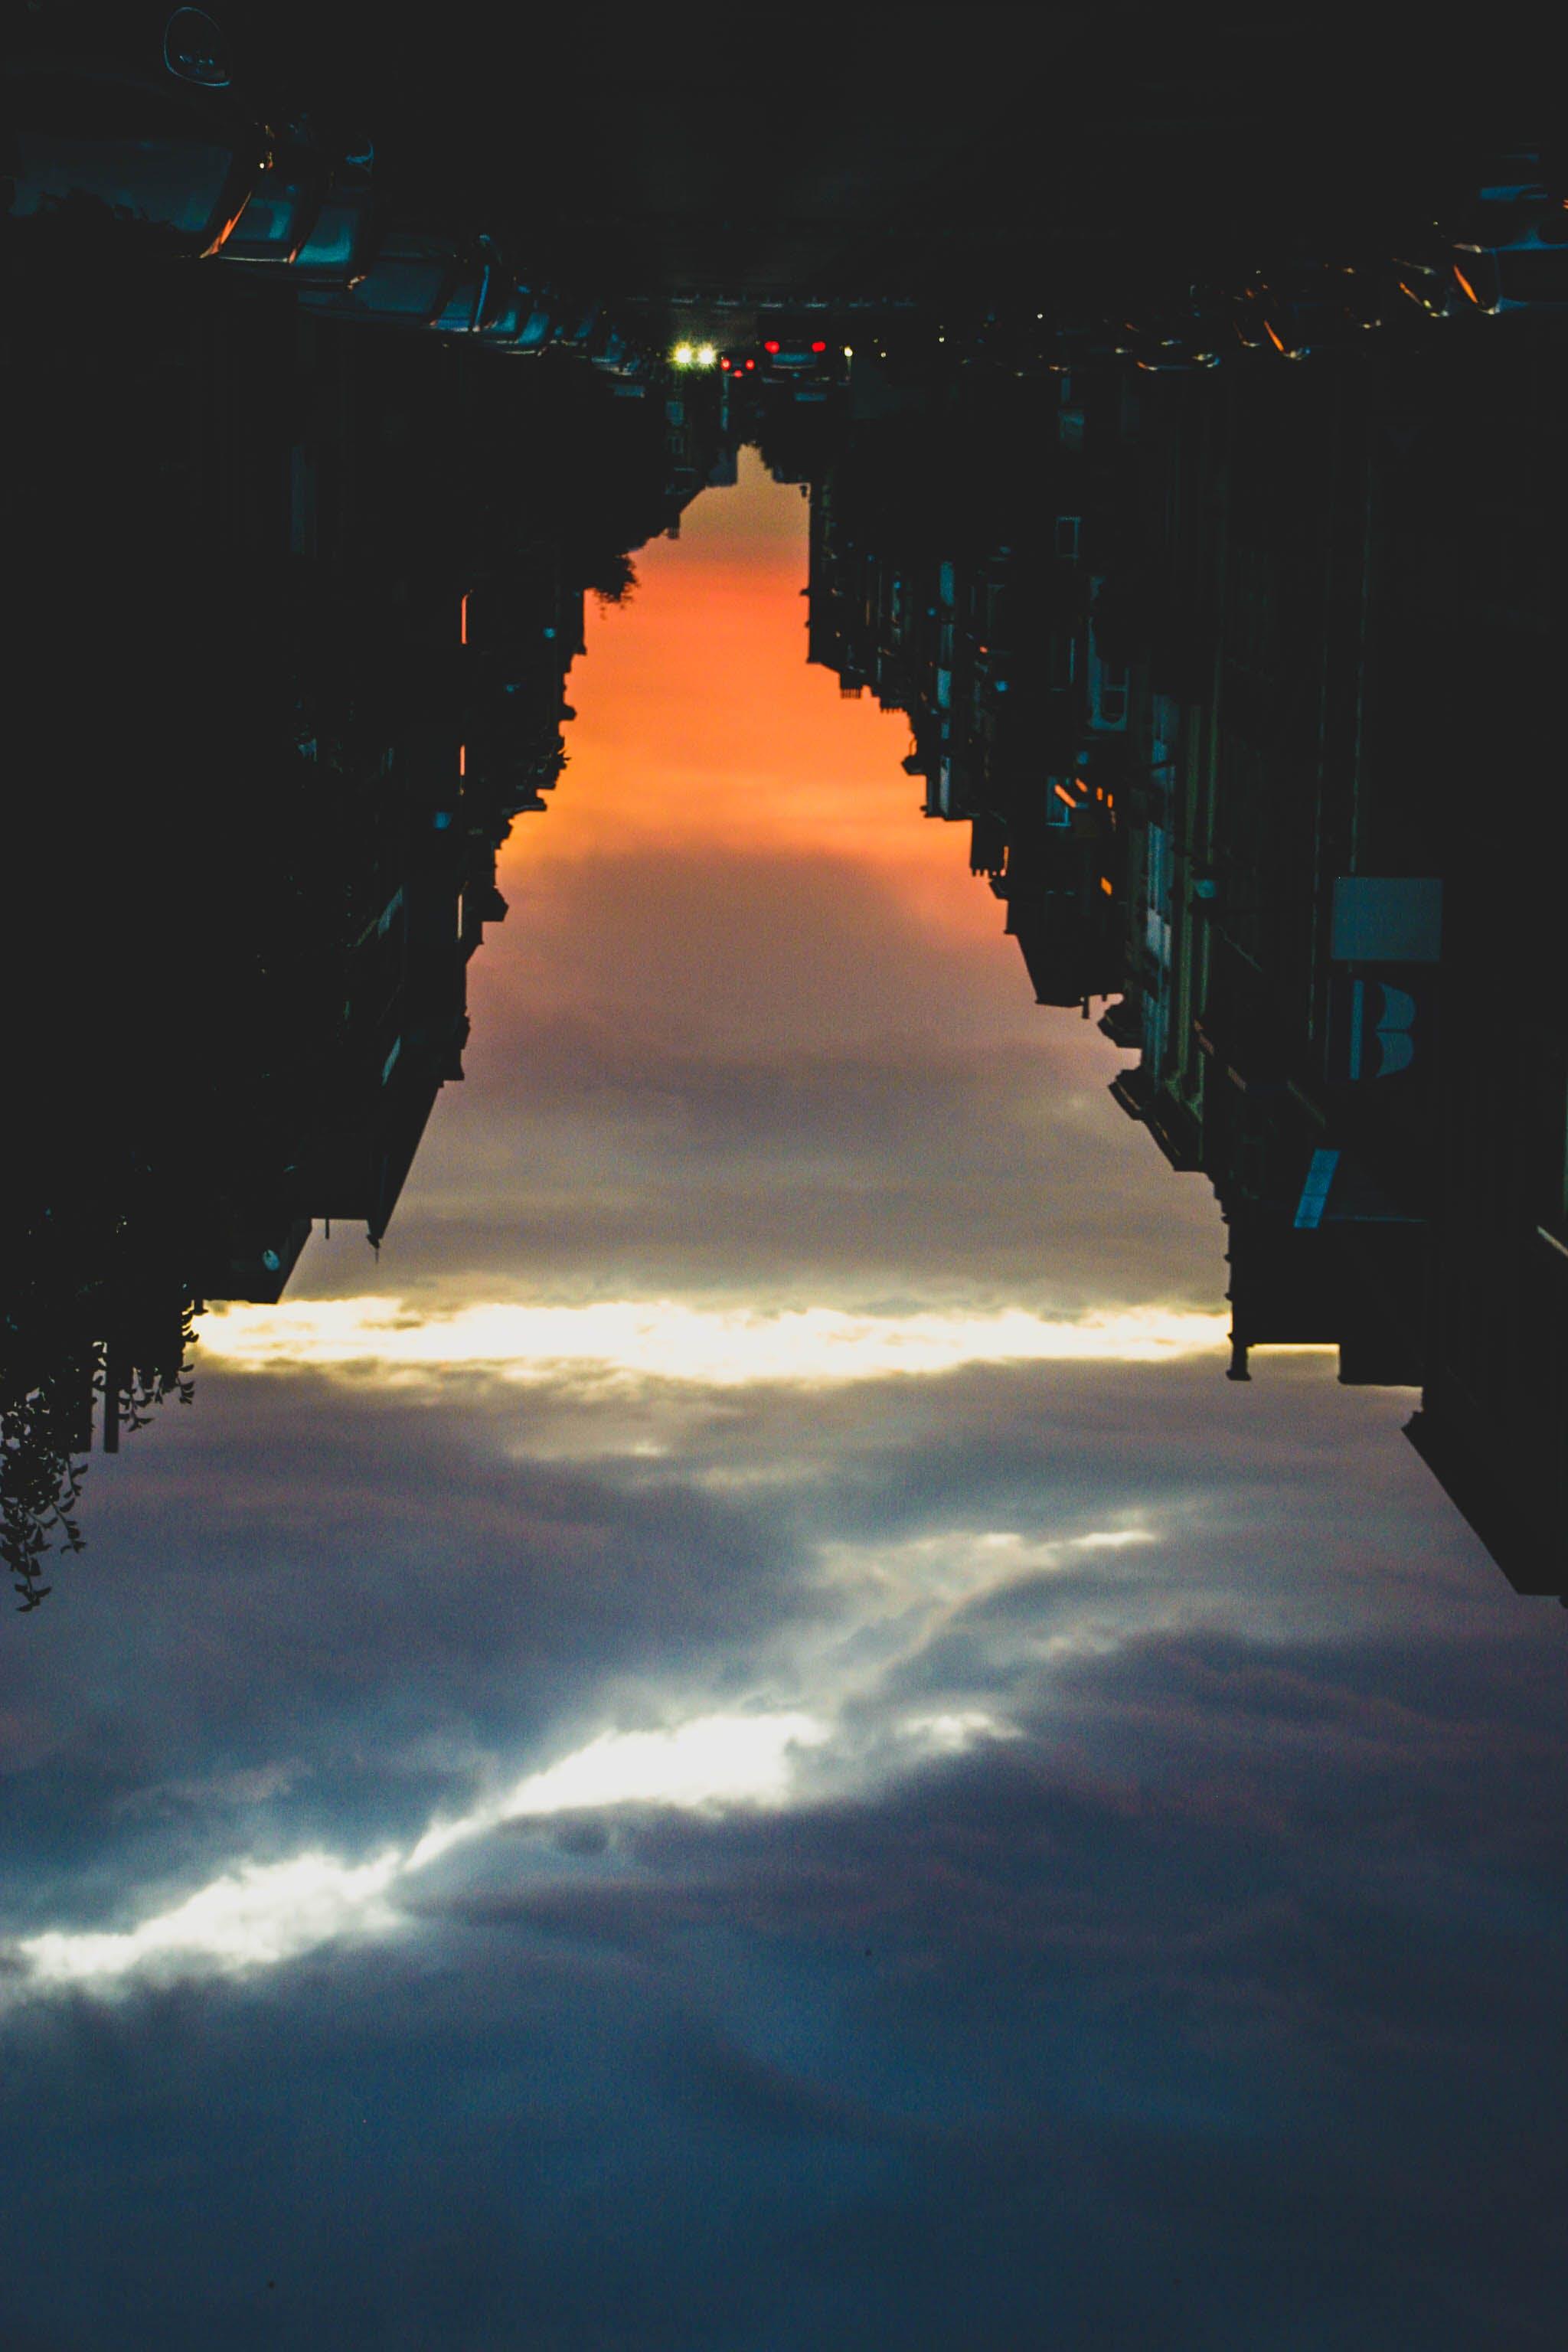 Free stock photo of city, lights, mountain, sunset